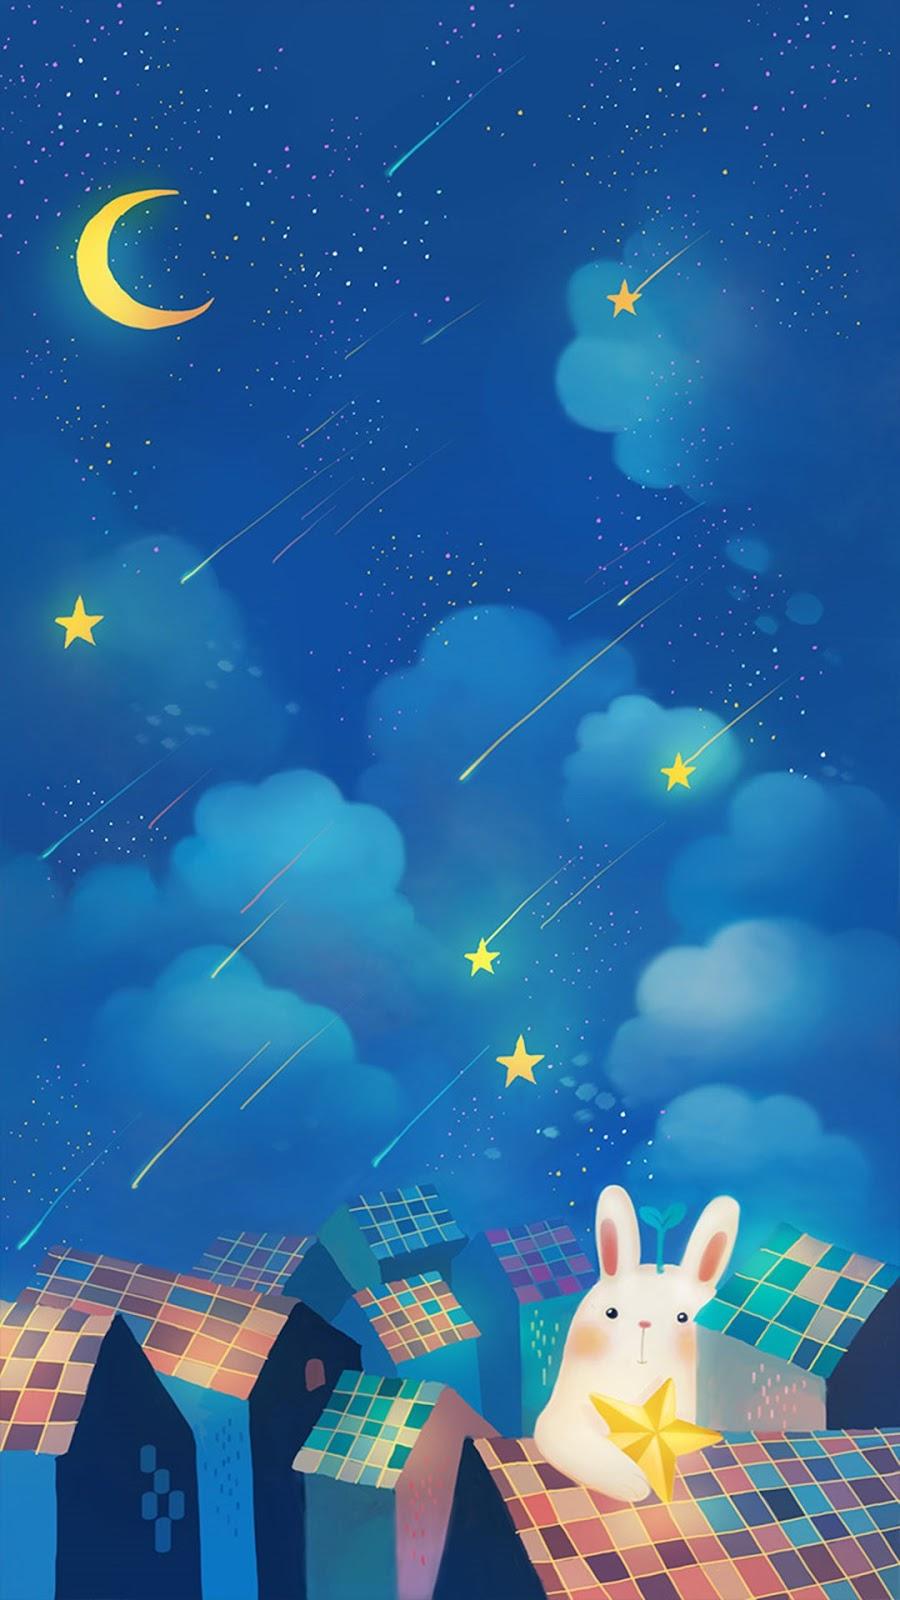 Romantic Night Moon Star Clouds Sky Rabbit House Iphone 7